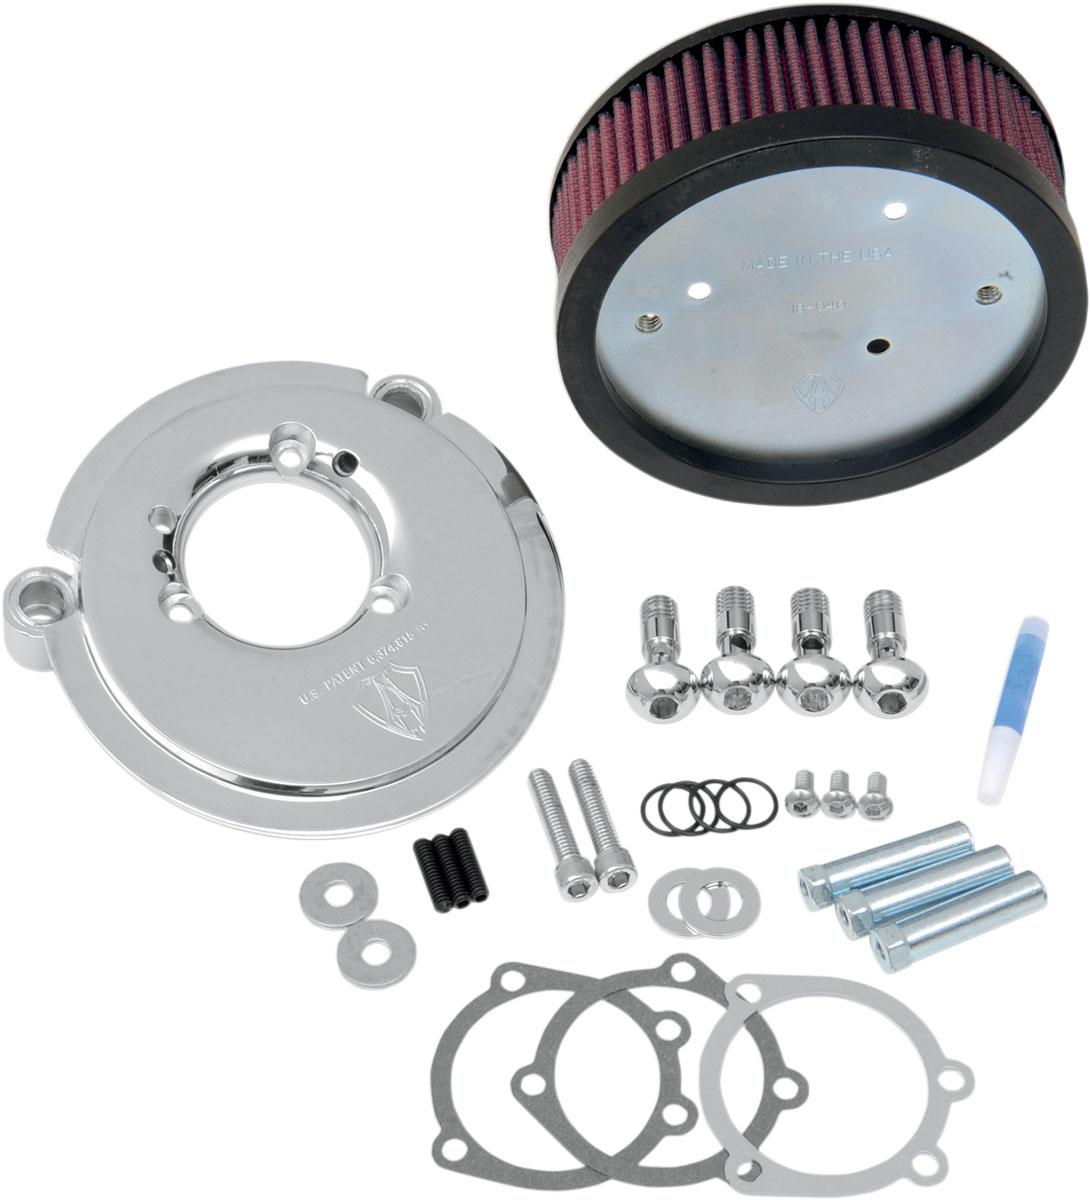 Arlen Ness - 18-825 - Big Sucker Stage I Air Filter Kit for OEM Cover